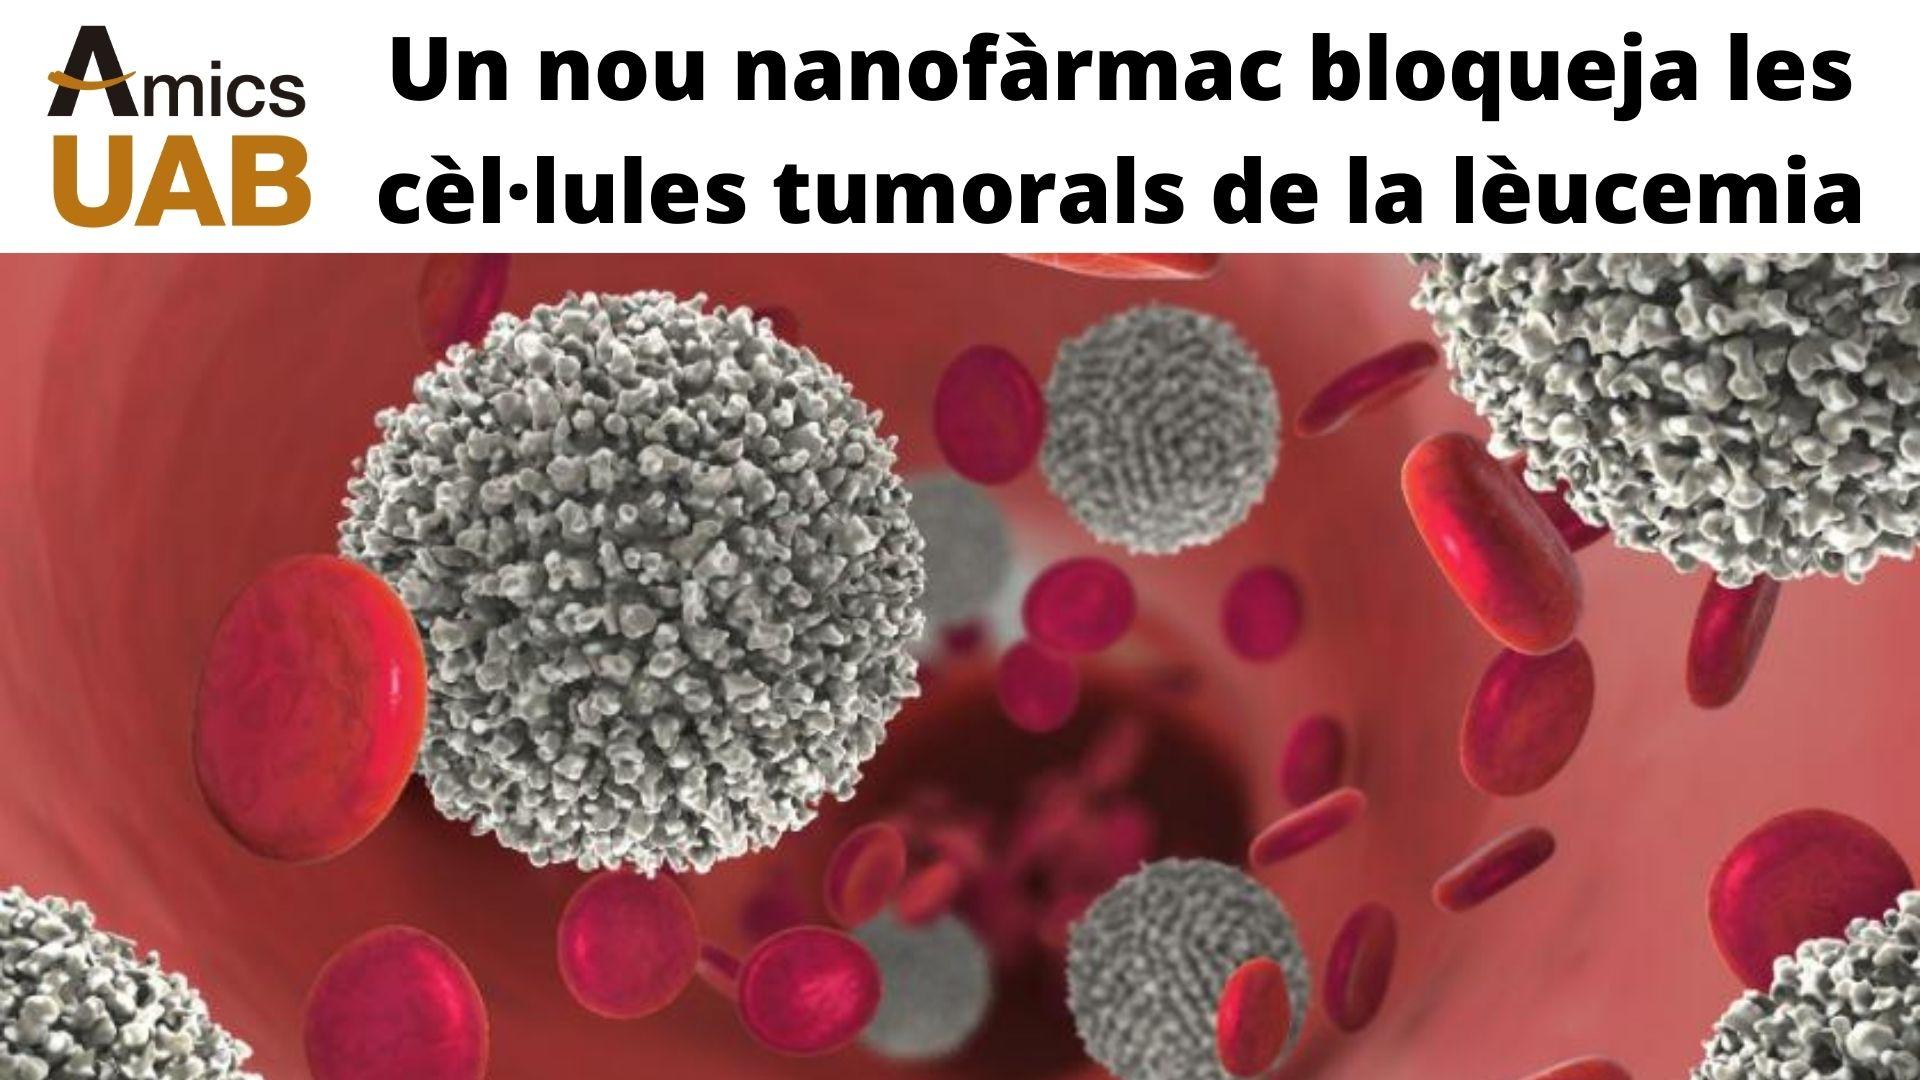 Nanofàrmac leucèmia